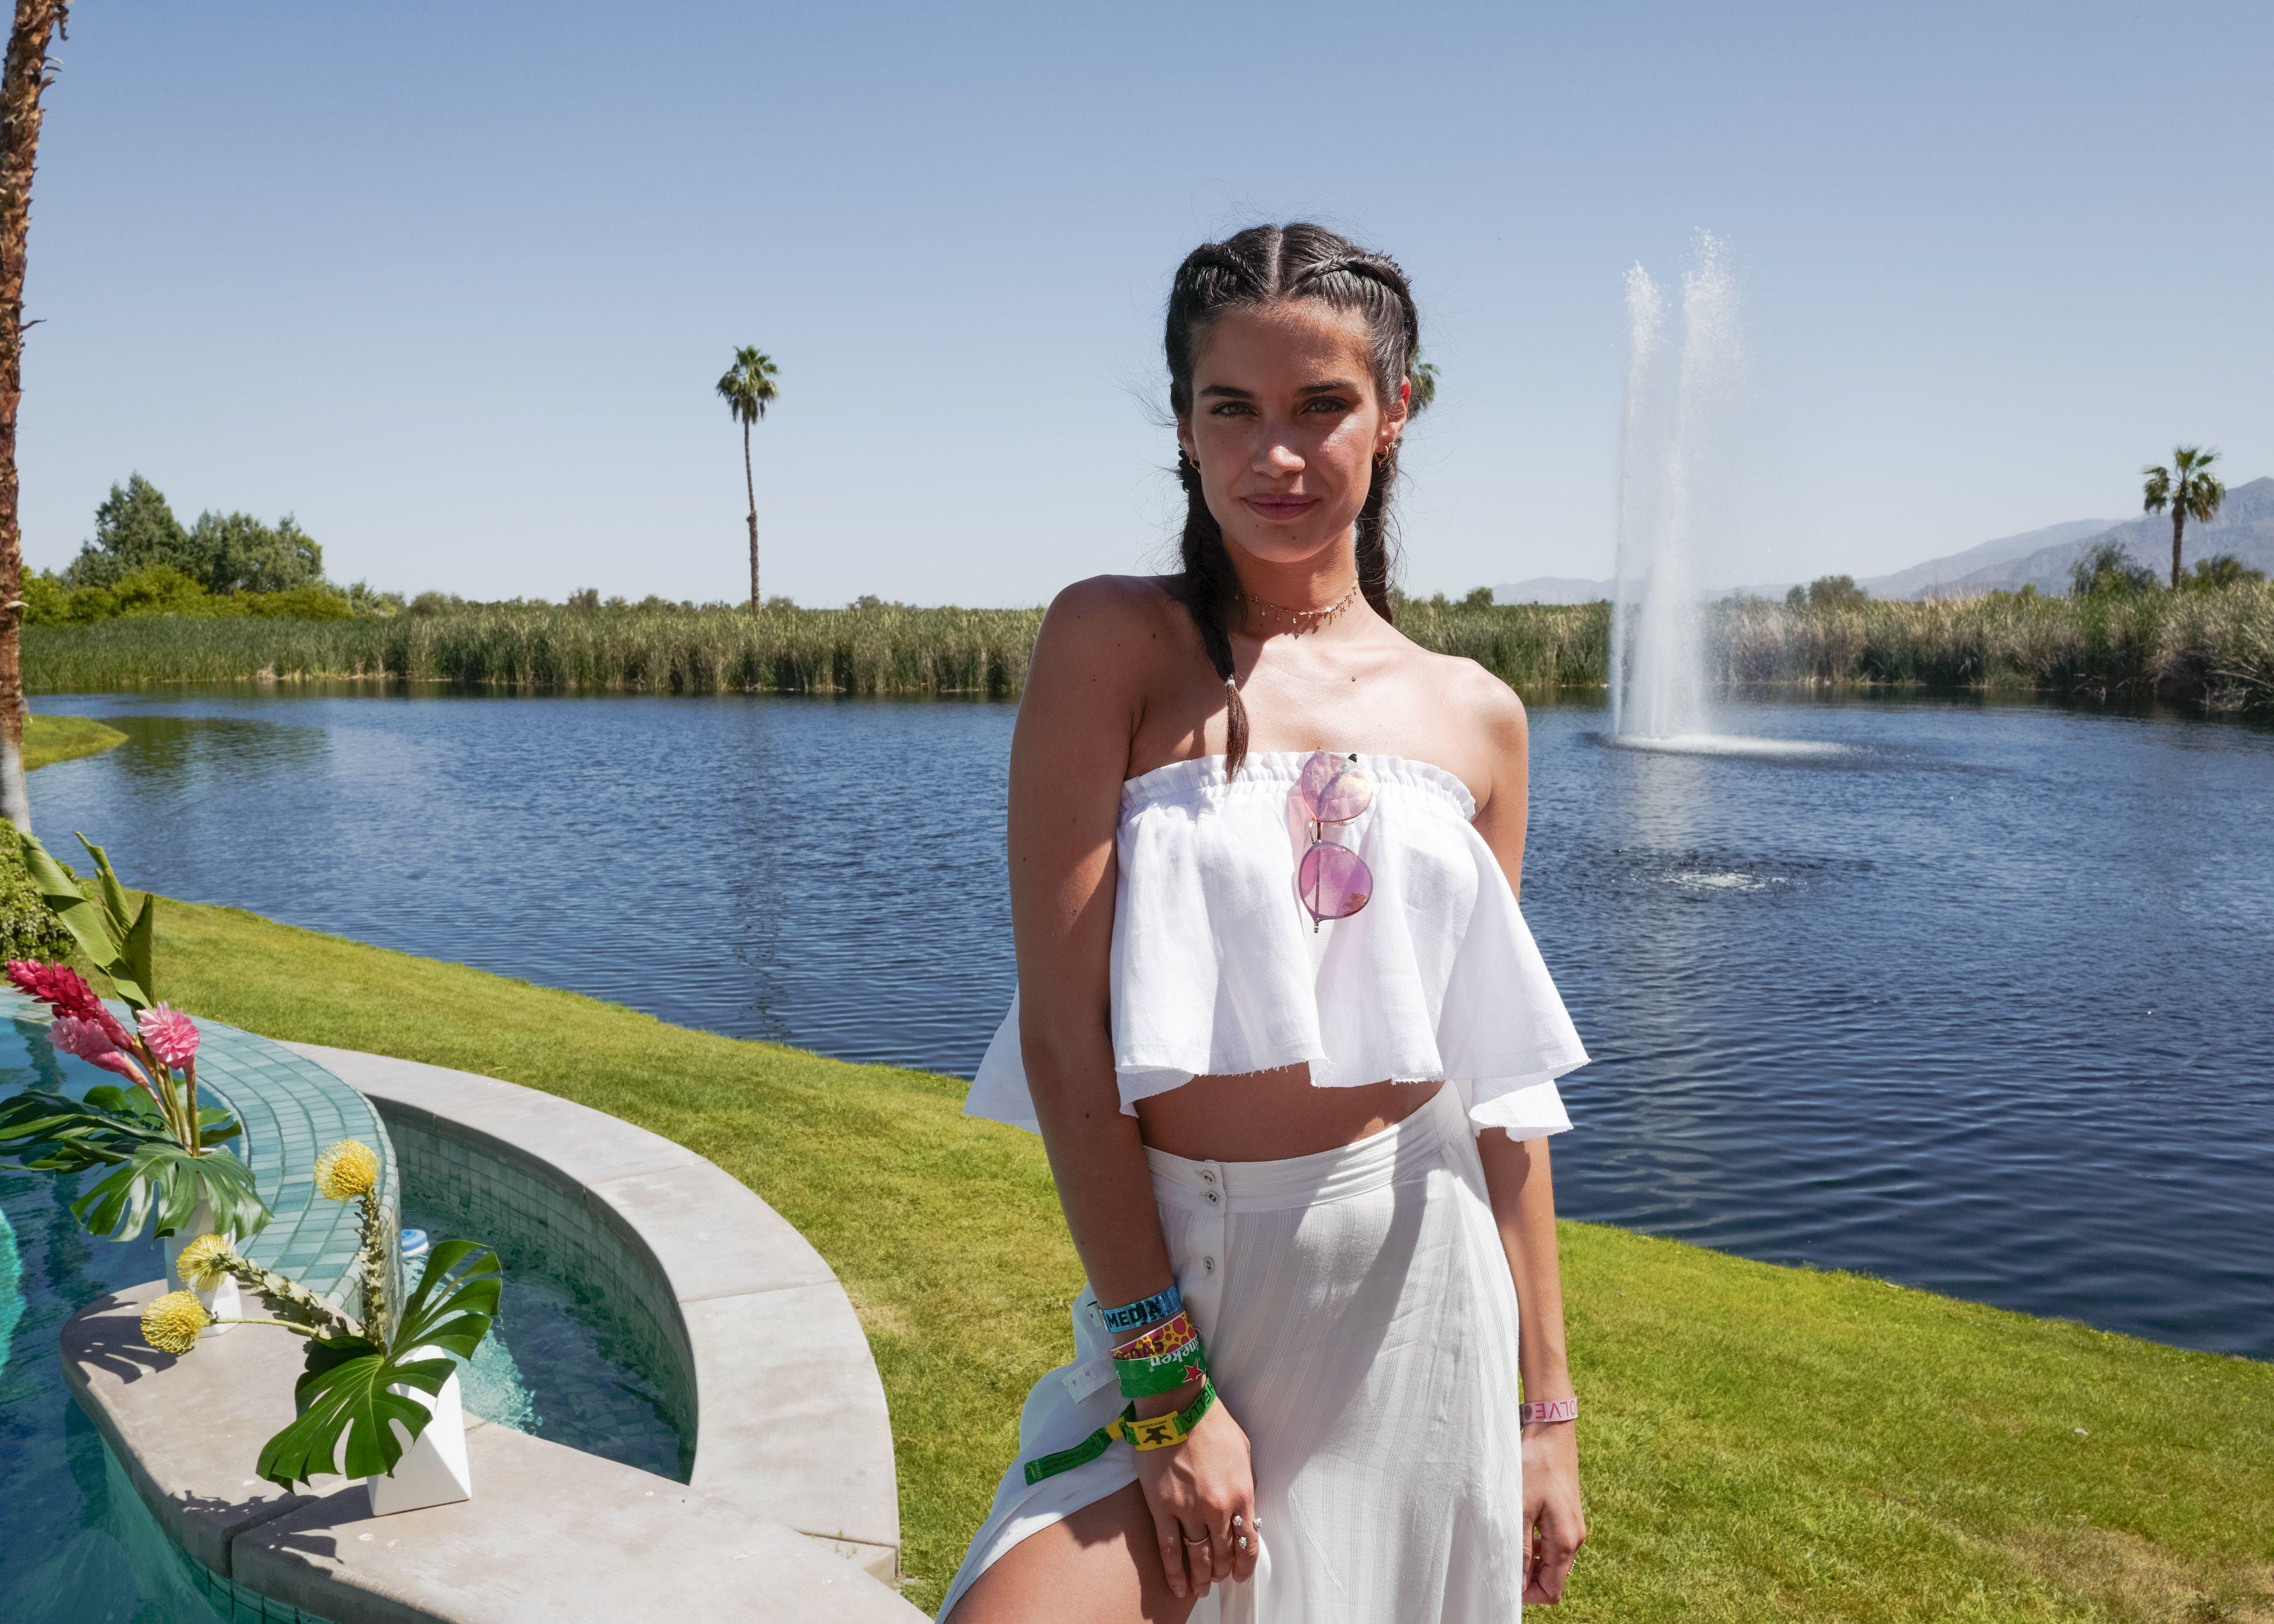 Sara SampaioREVOLVE festival, Coachella Valley Music and Arts Festival, Palm Springs, USA - 15 Apr 2017